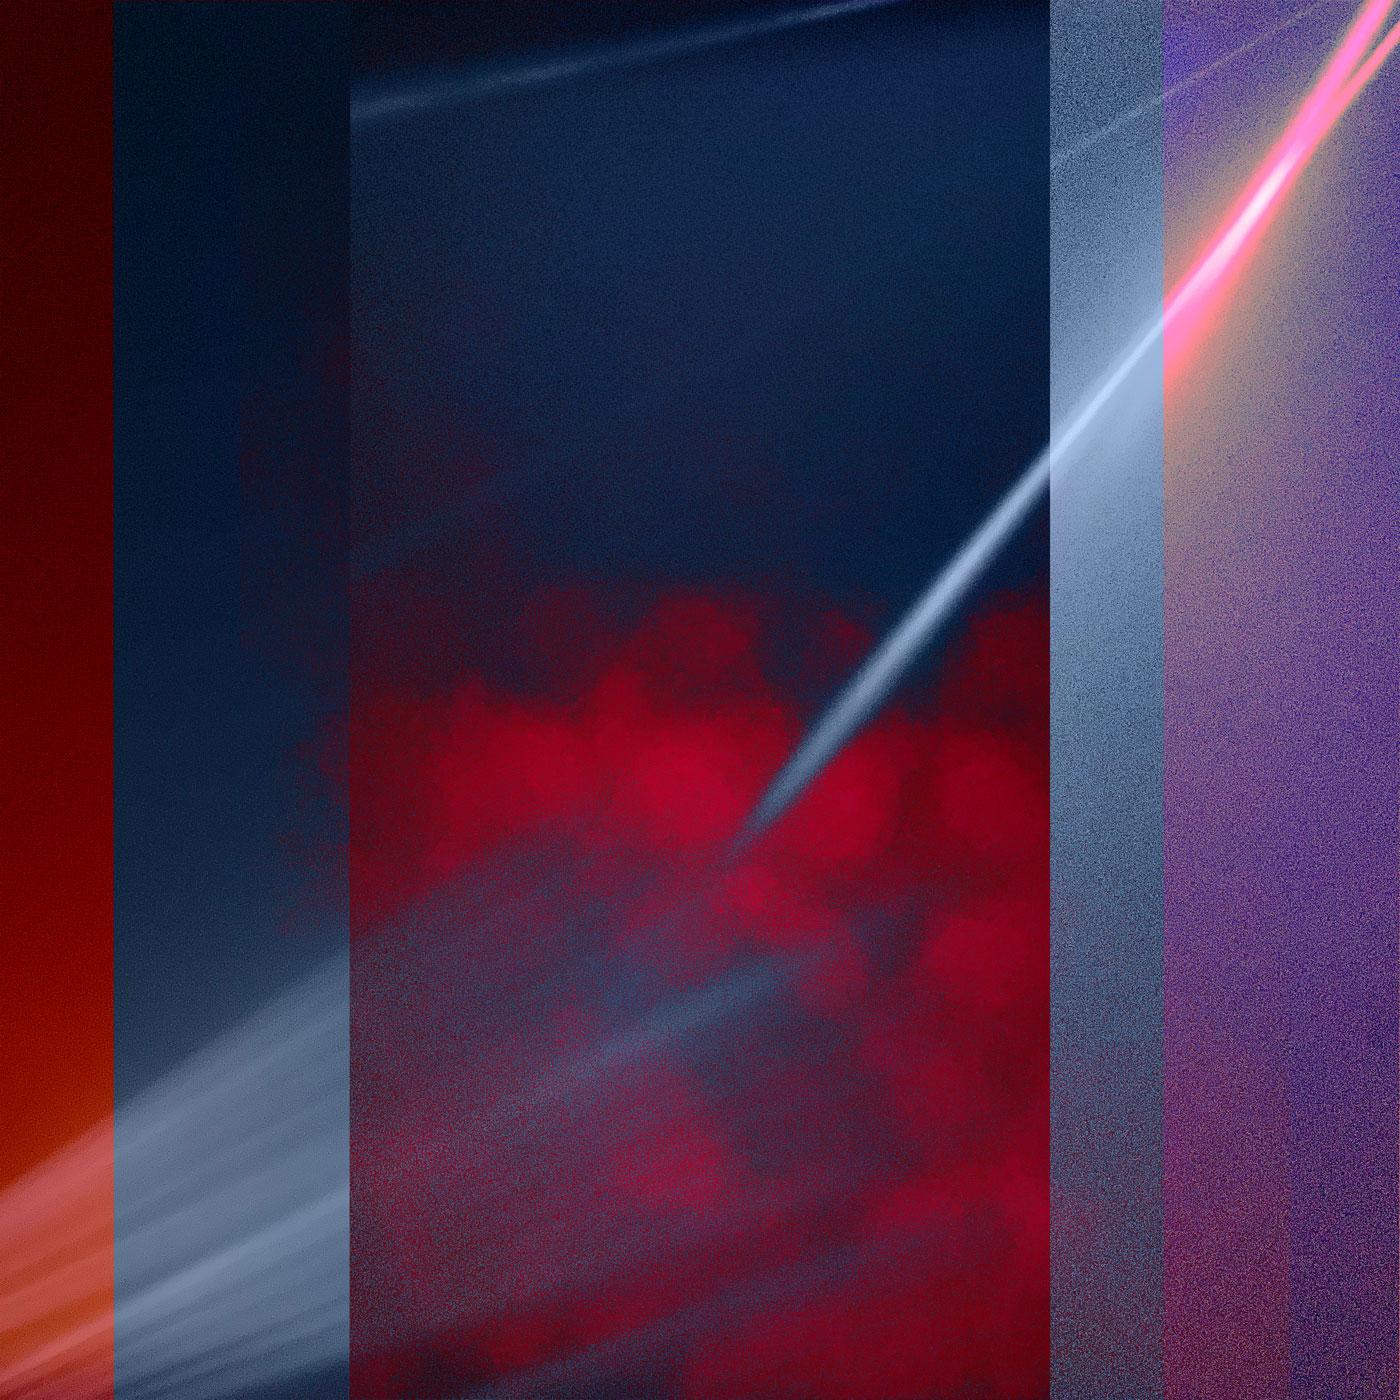 Second Light • 122 x 122 cm (48.03 x 48.03 in)